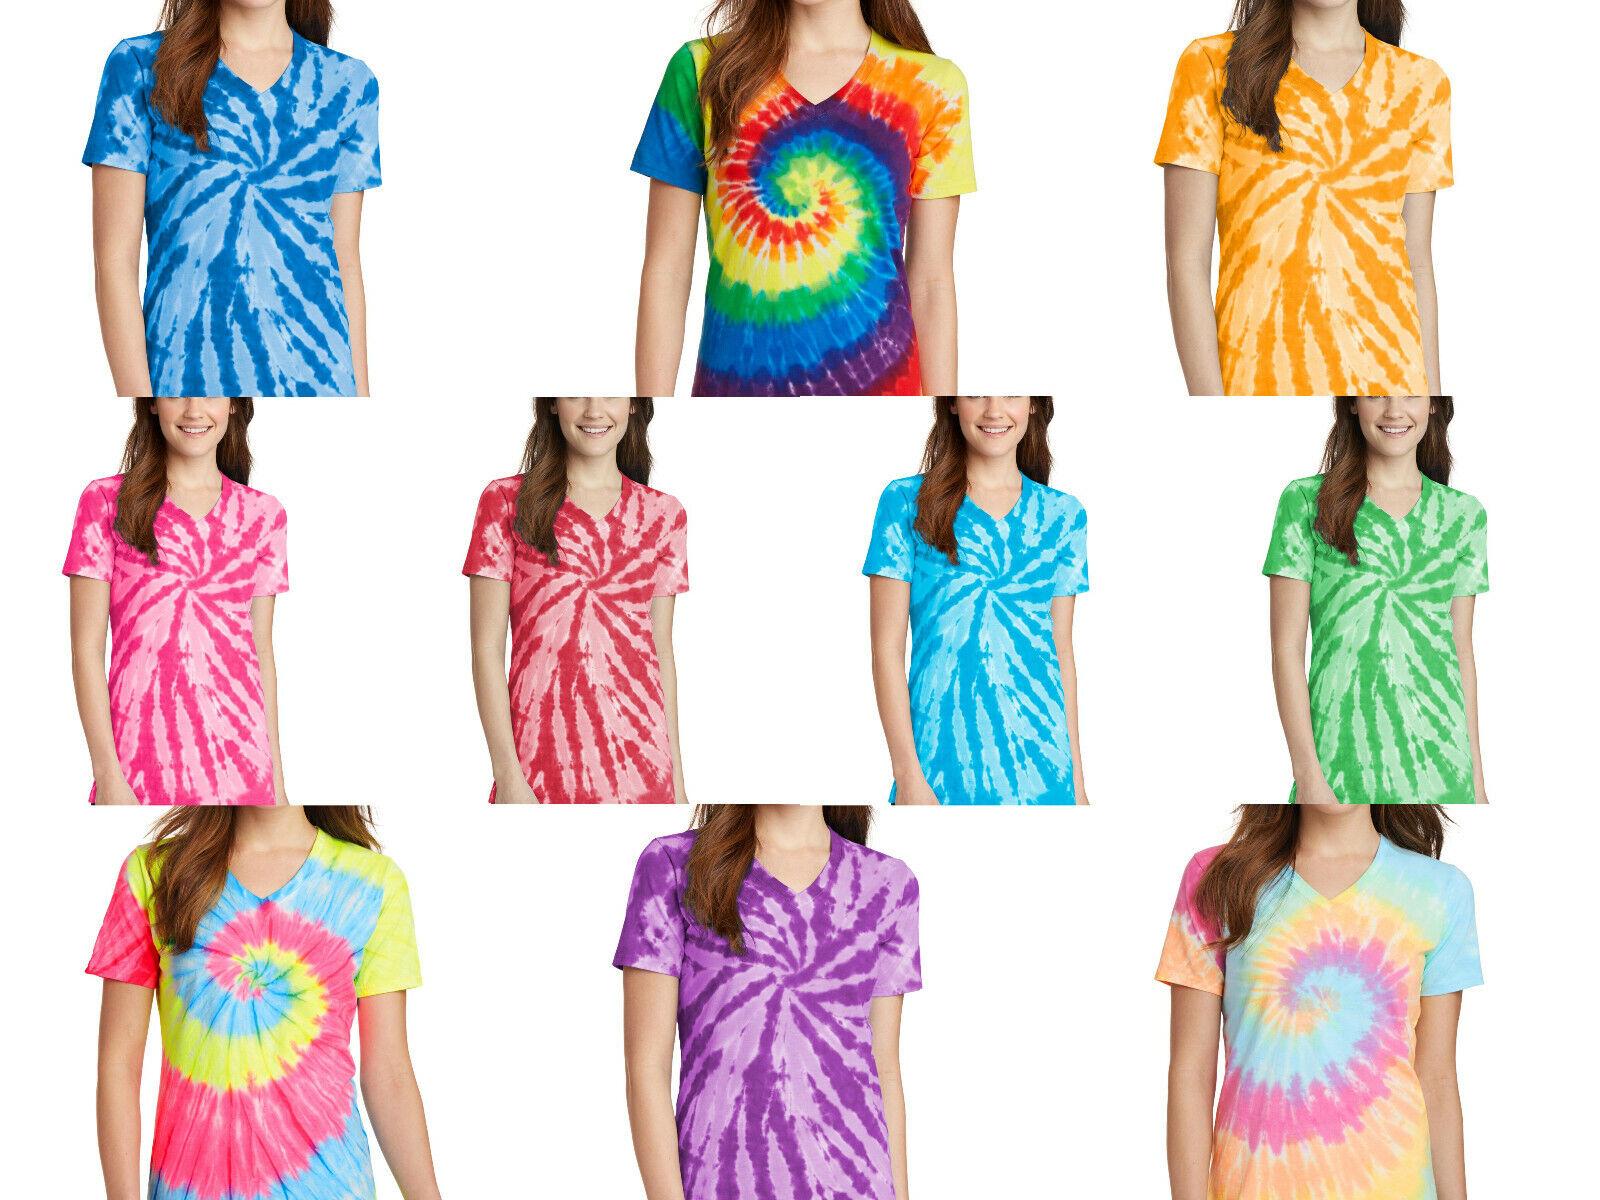 как выглядит New Ladies Tie-Dye Tee Tye Dyed V-Neck T-Shirt Spiral Women